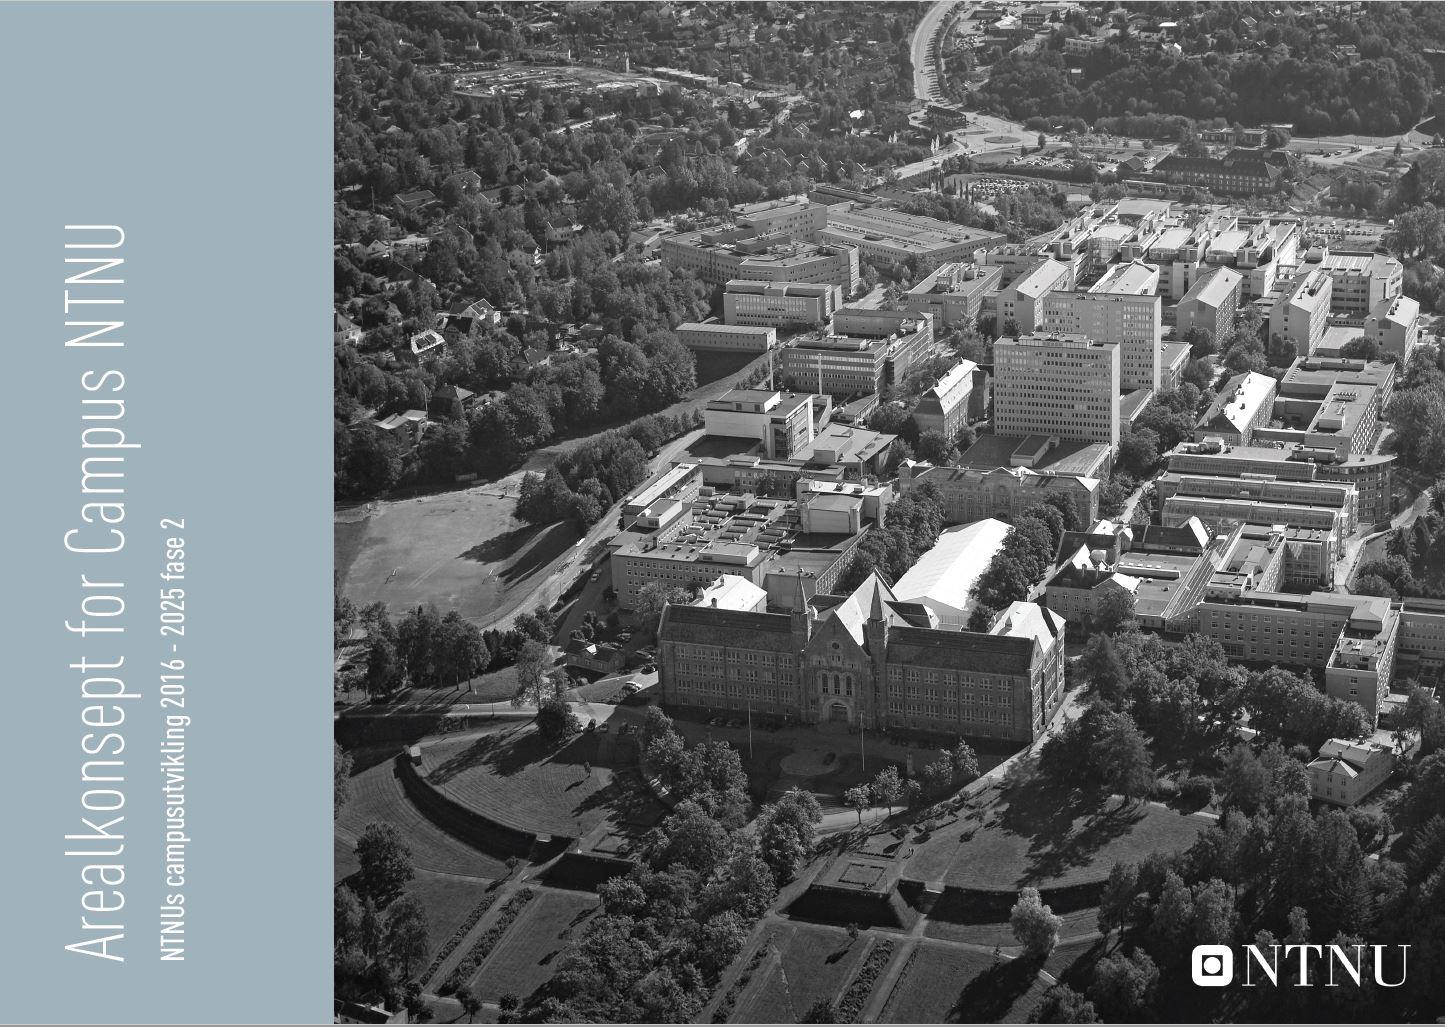 Forside - Arealkonsept for framtidens campus